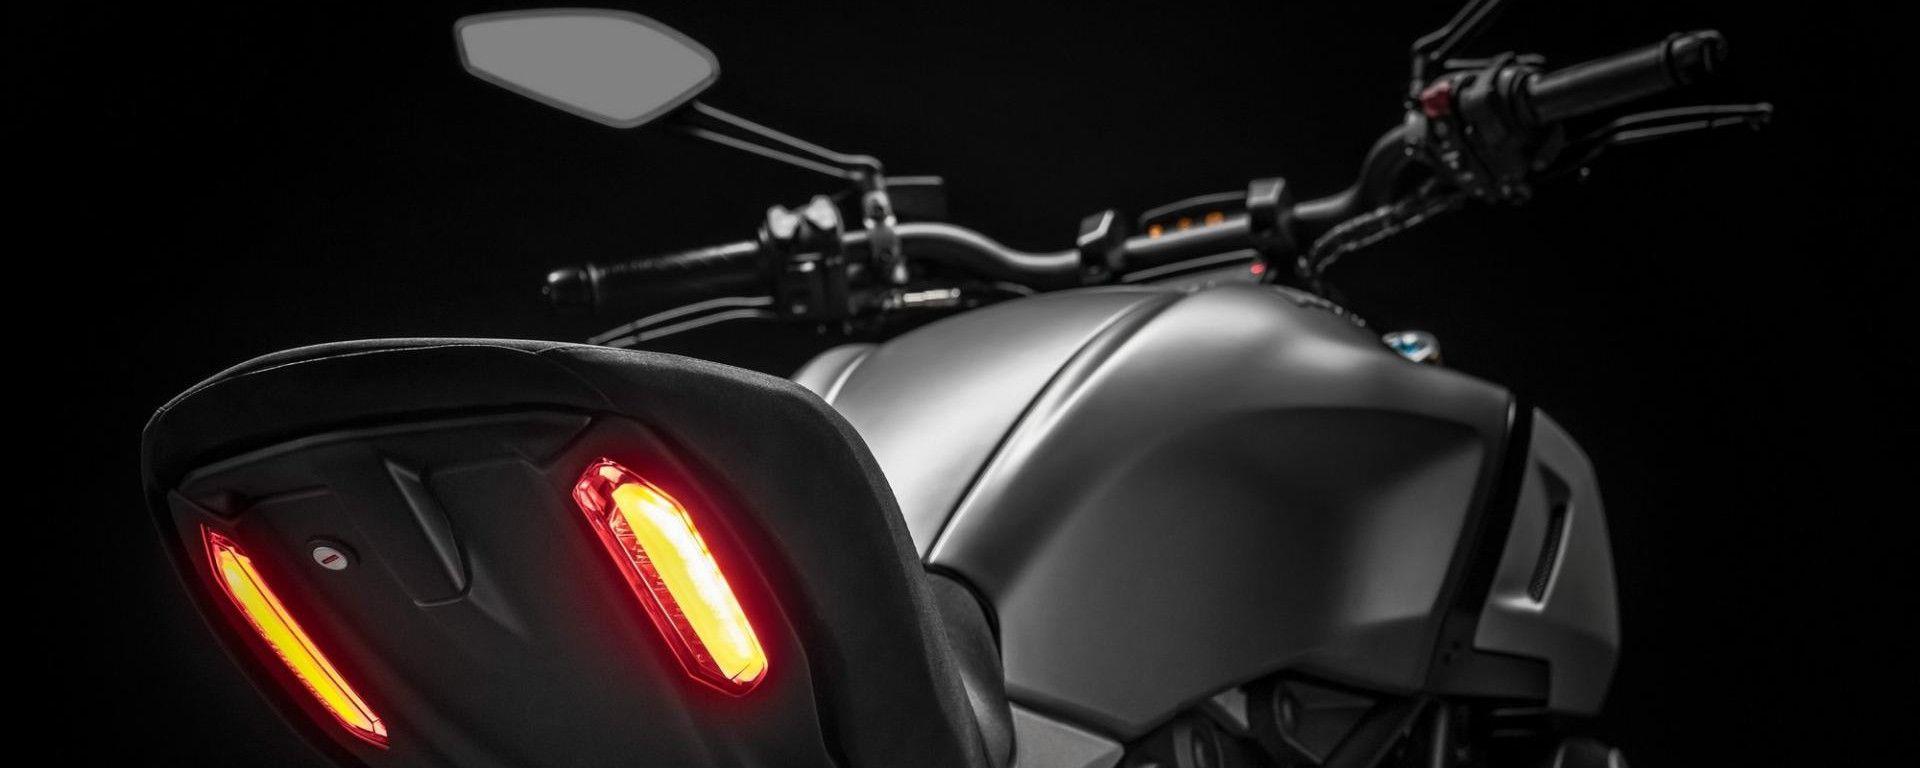 In arrivo una Ducati Diavel 1260 Lamborghini?